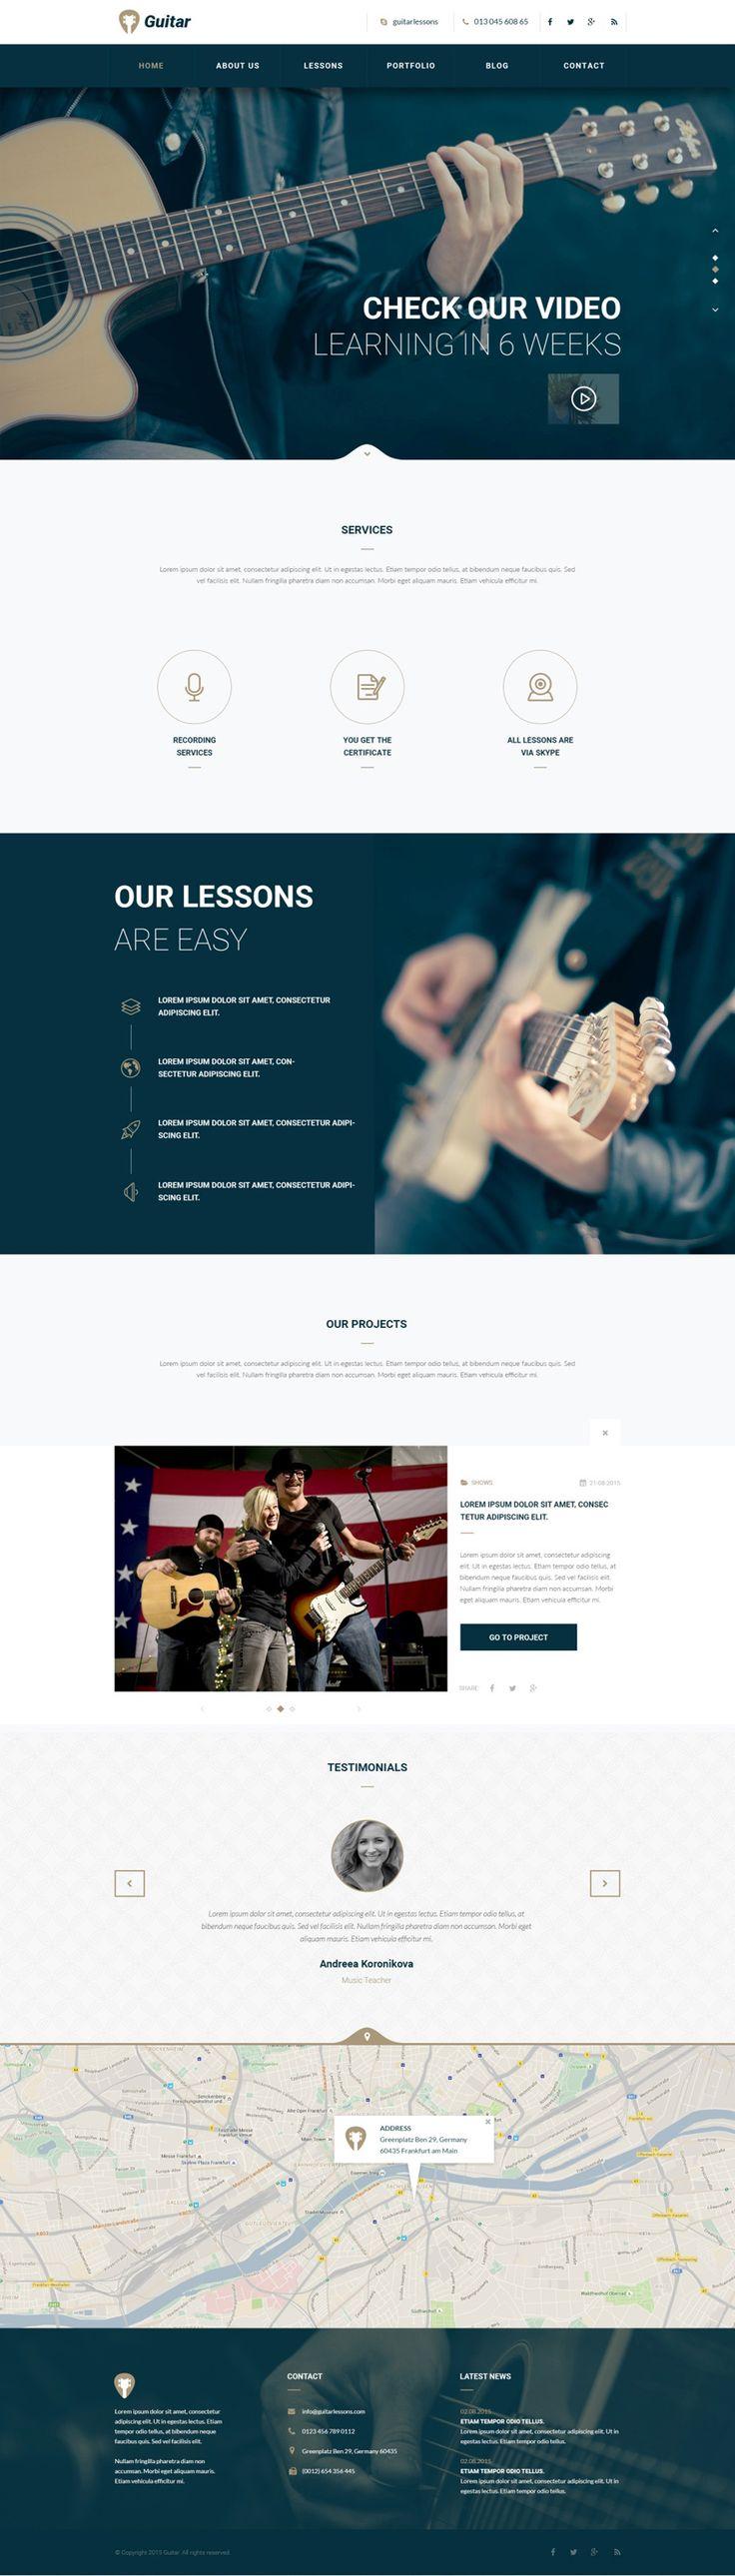 guitar-school-educational-music-psd-template